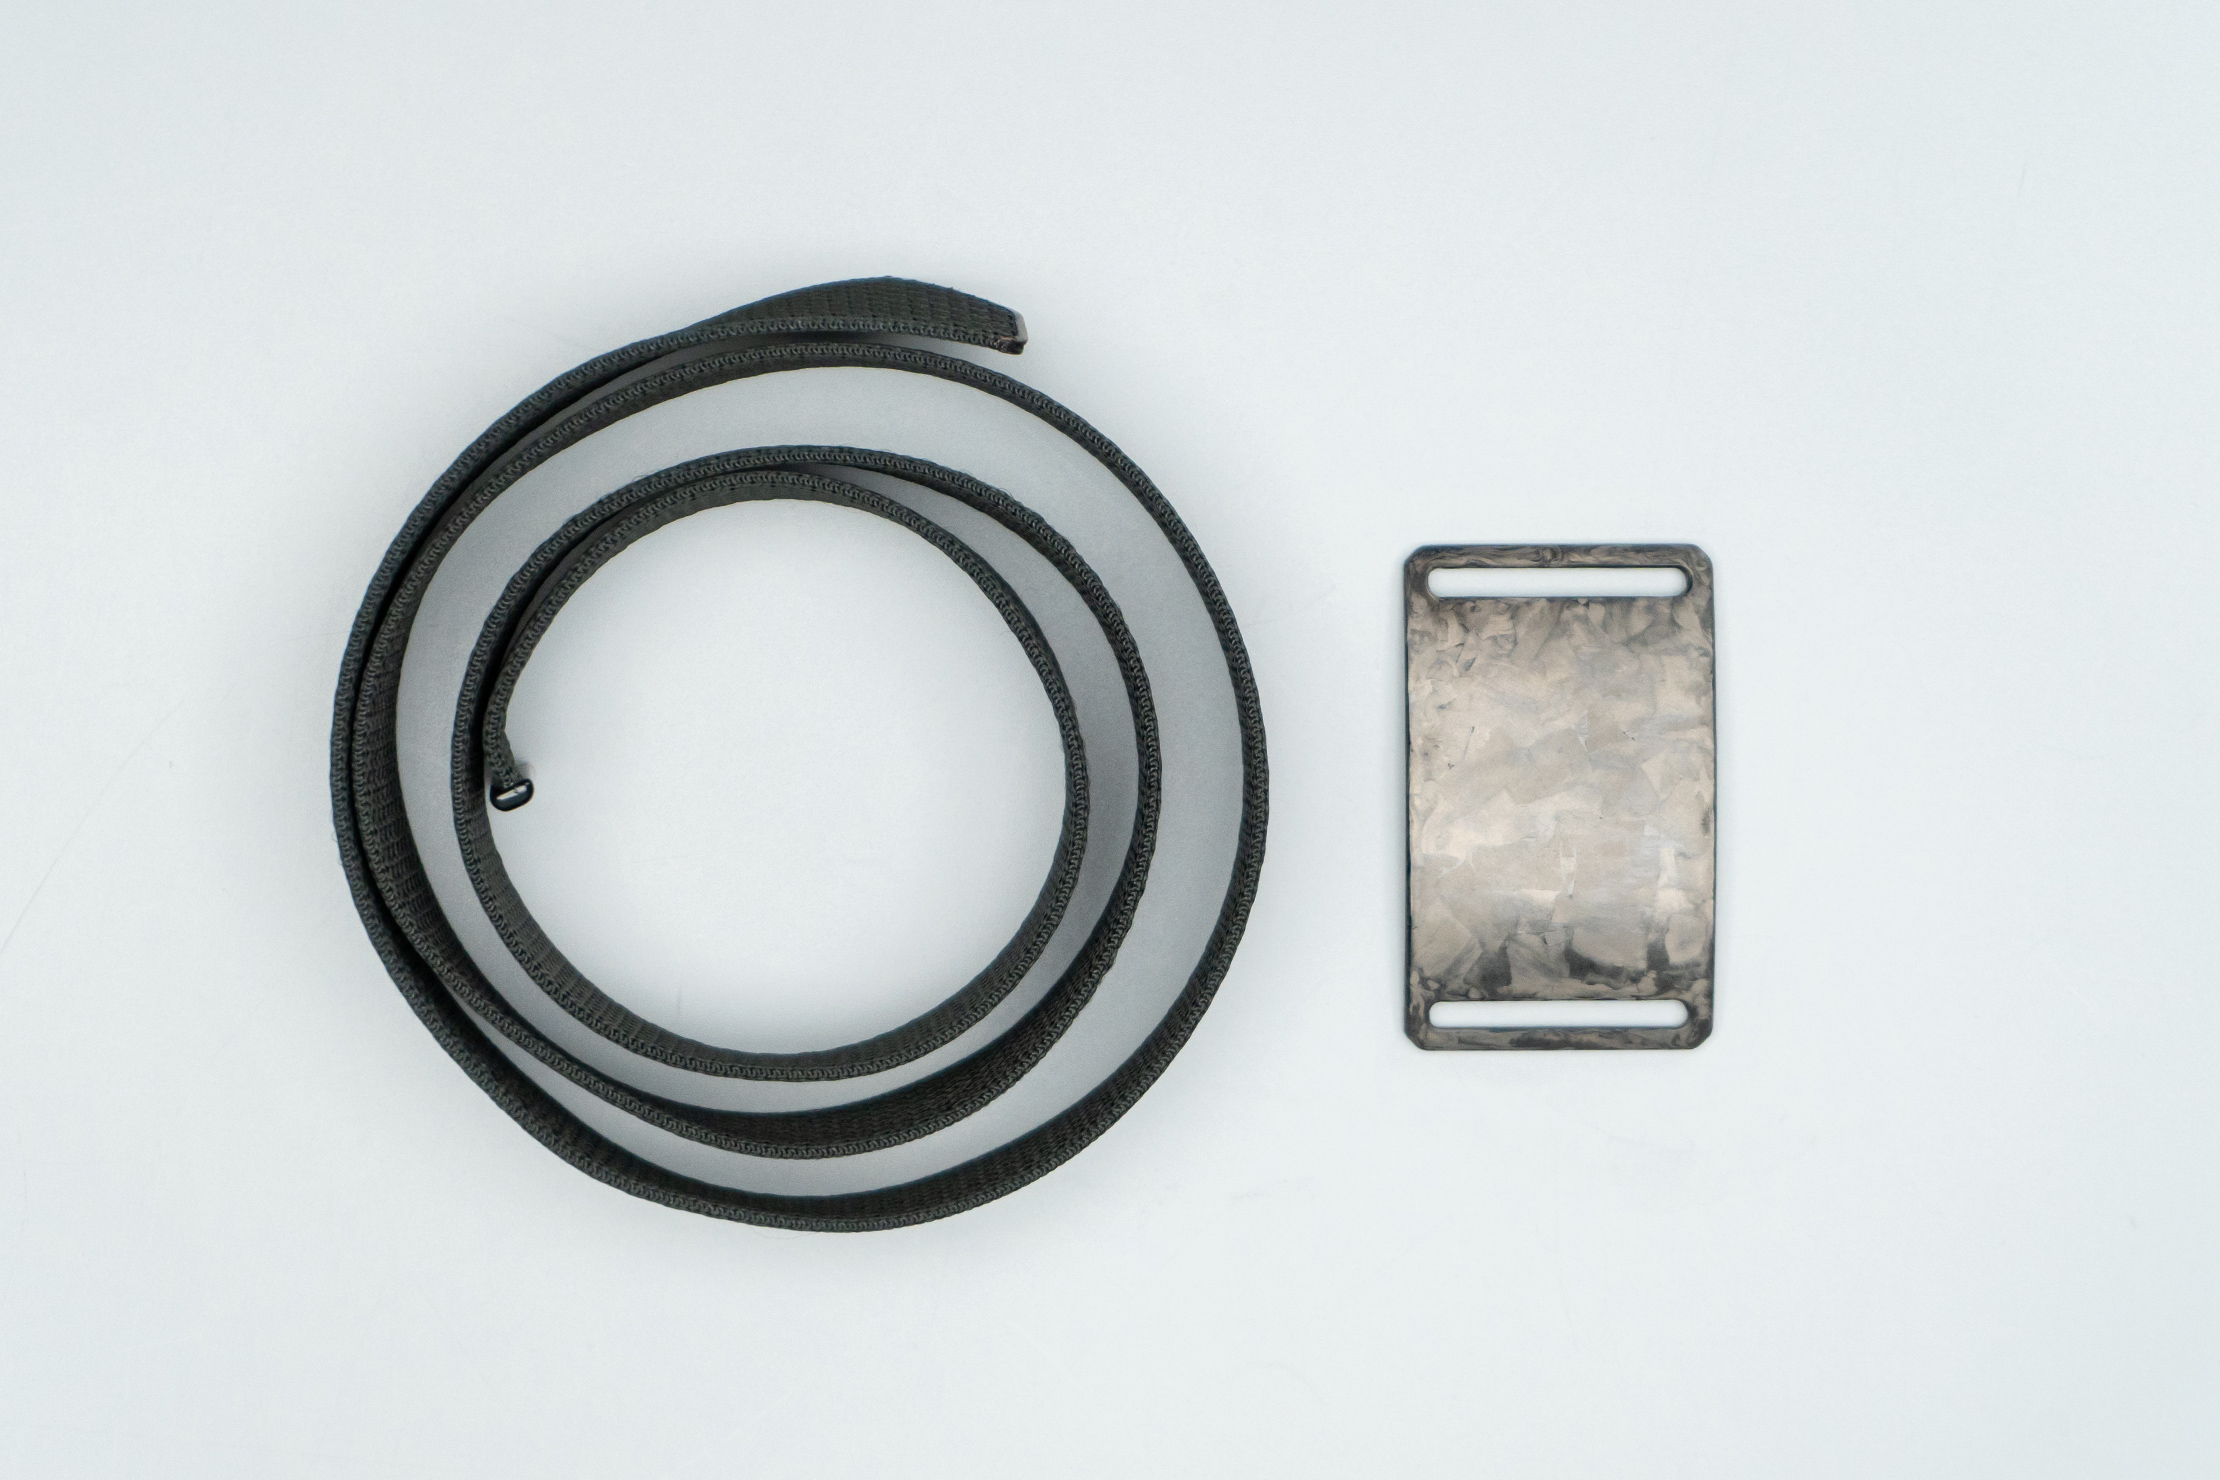 Grip6 Forged Carbon Fiber Belt Seperated